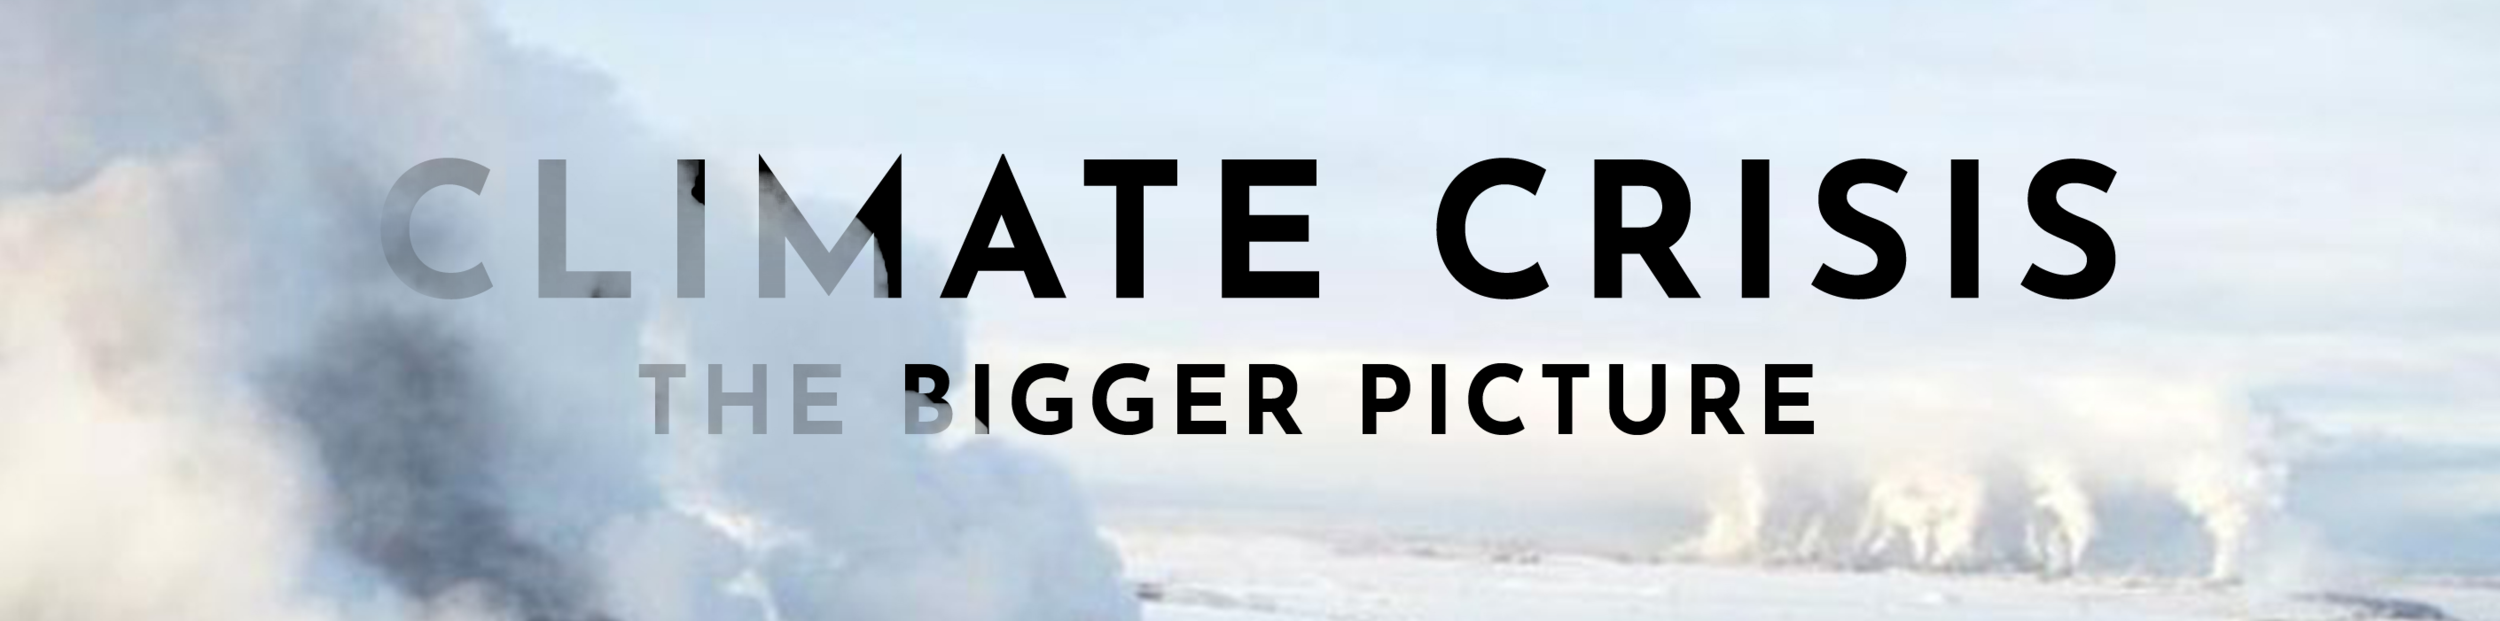 Climate Crisis Film Festival London The Bigger Picture header